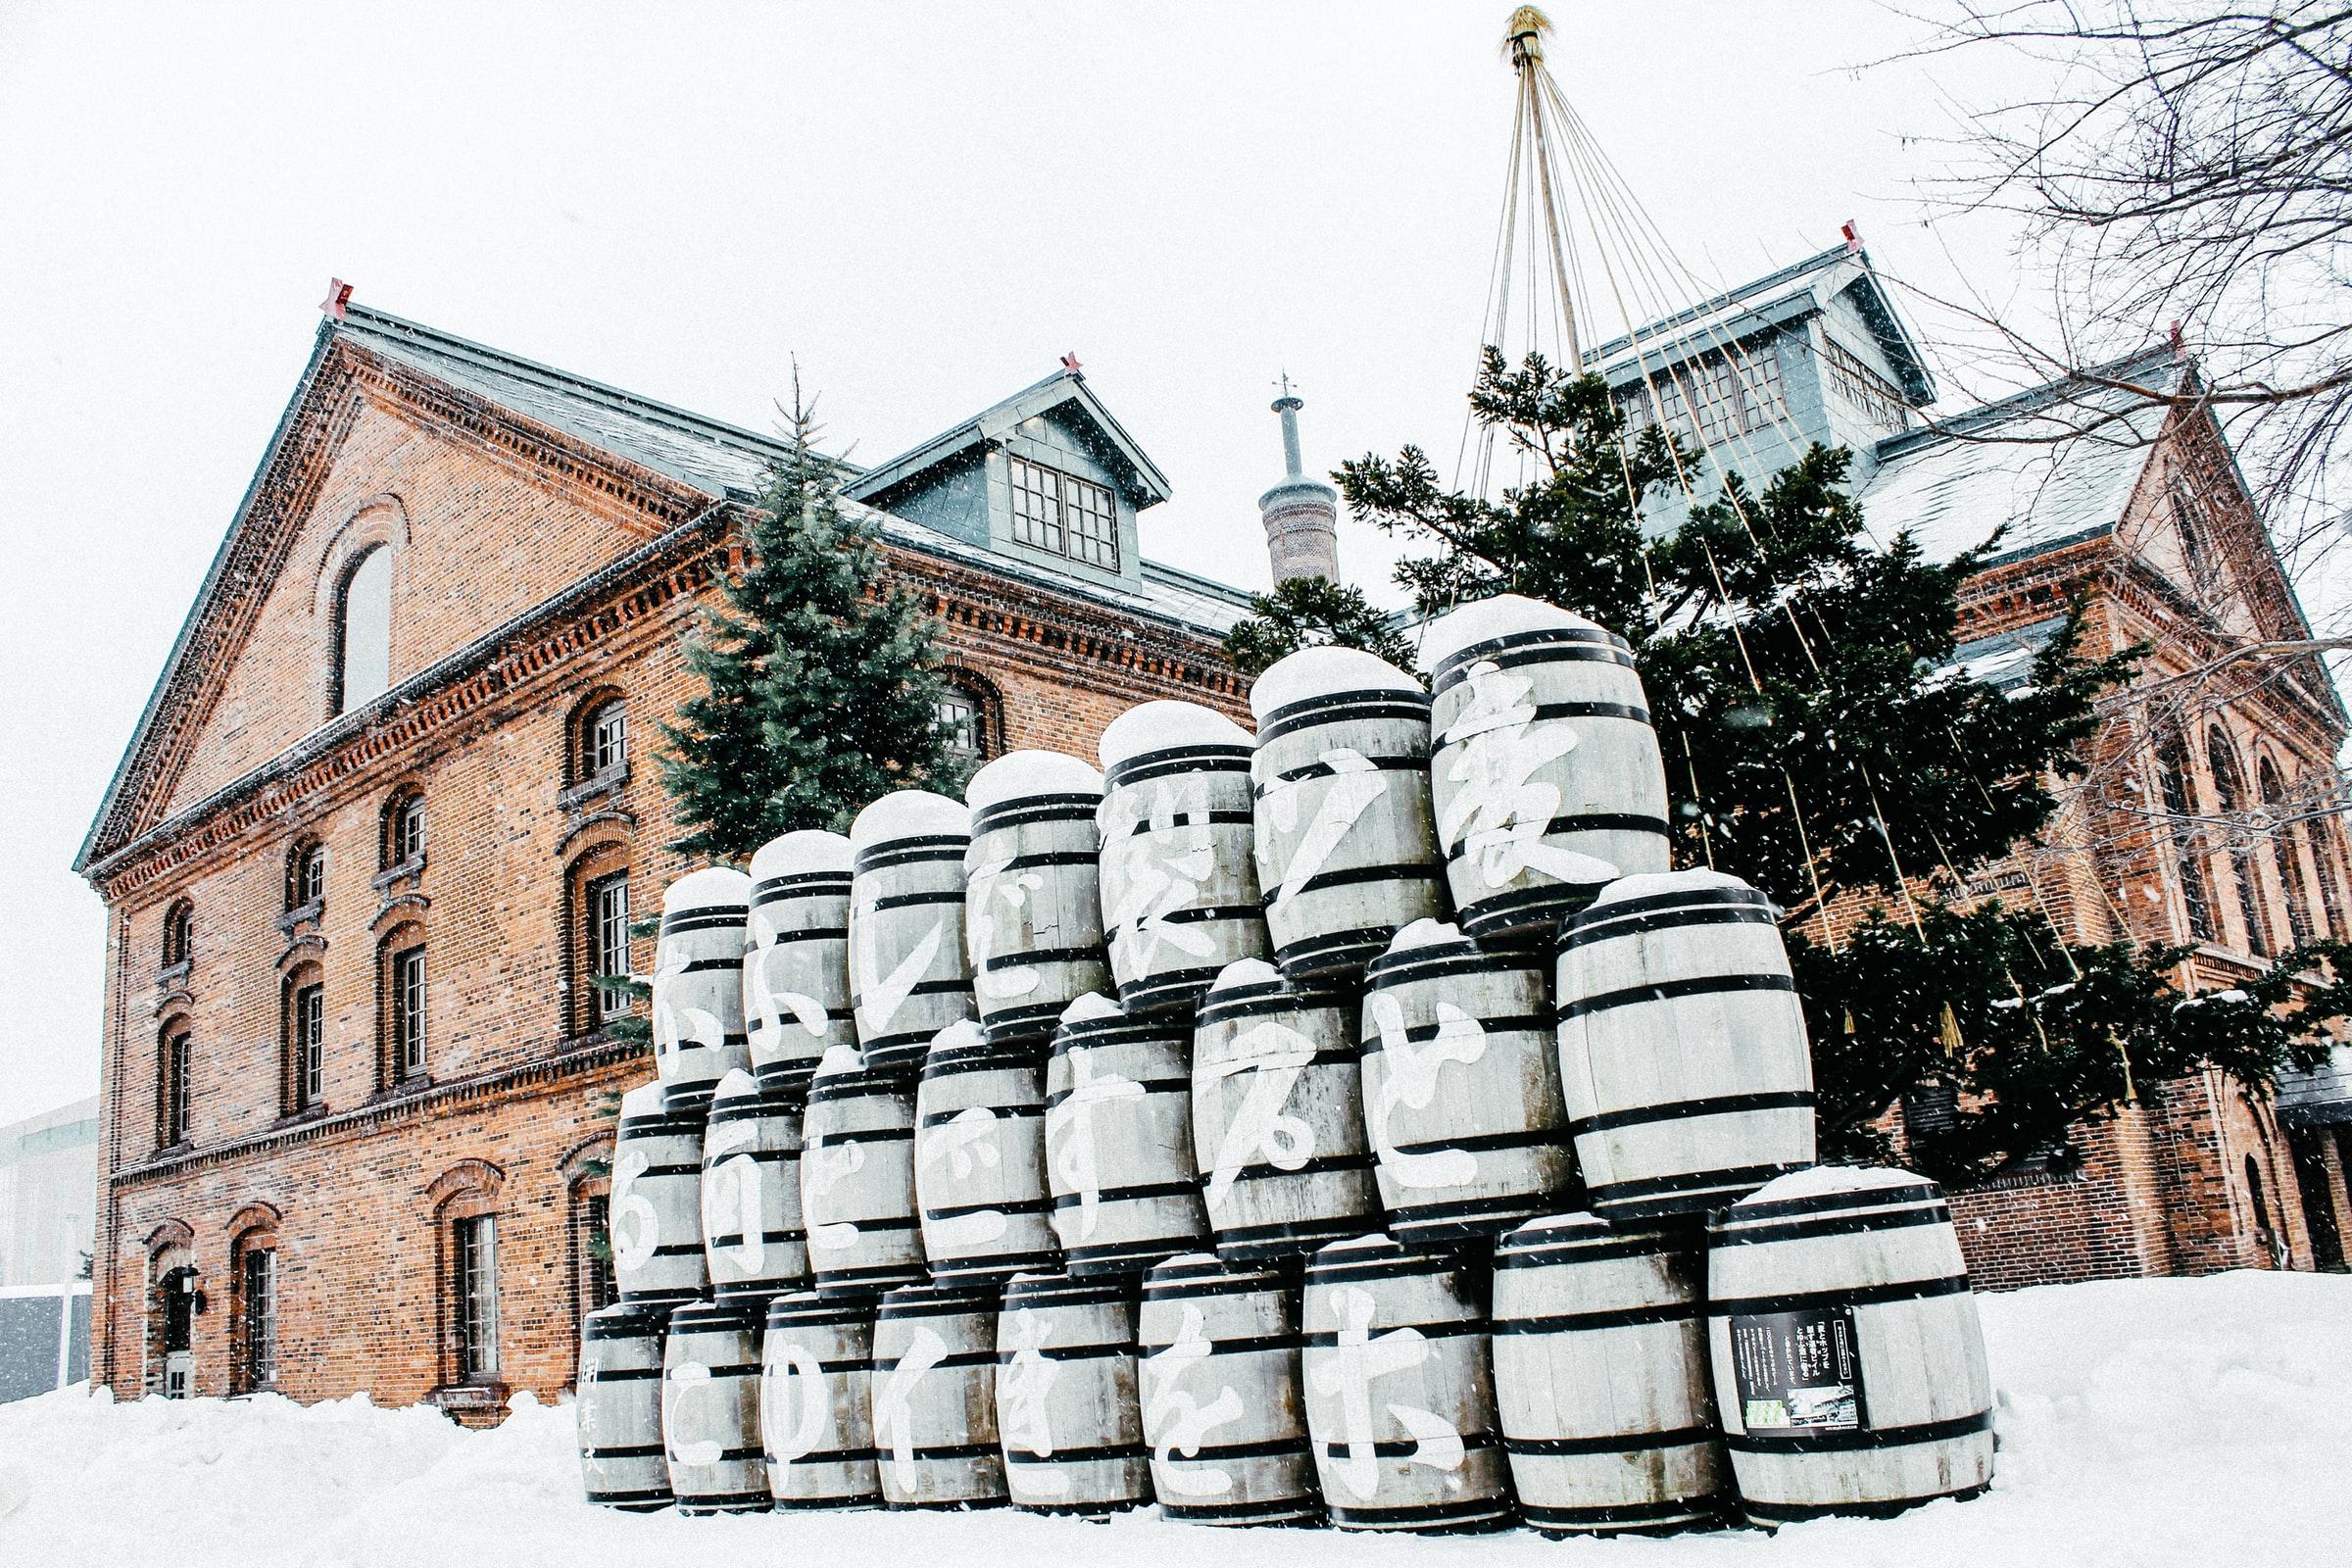 10 Things to do in Sapporo, Hokkaido, Japan 10